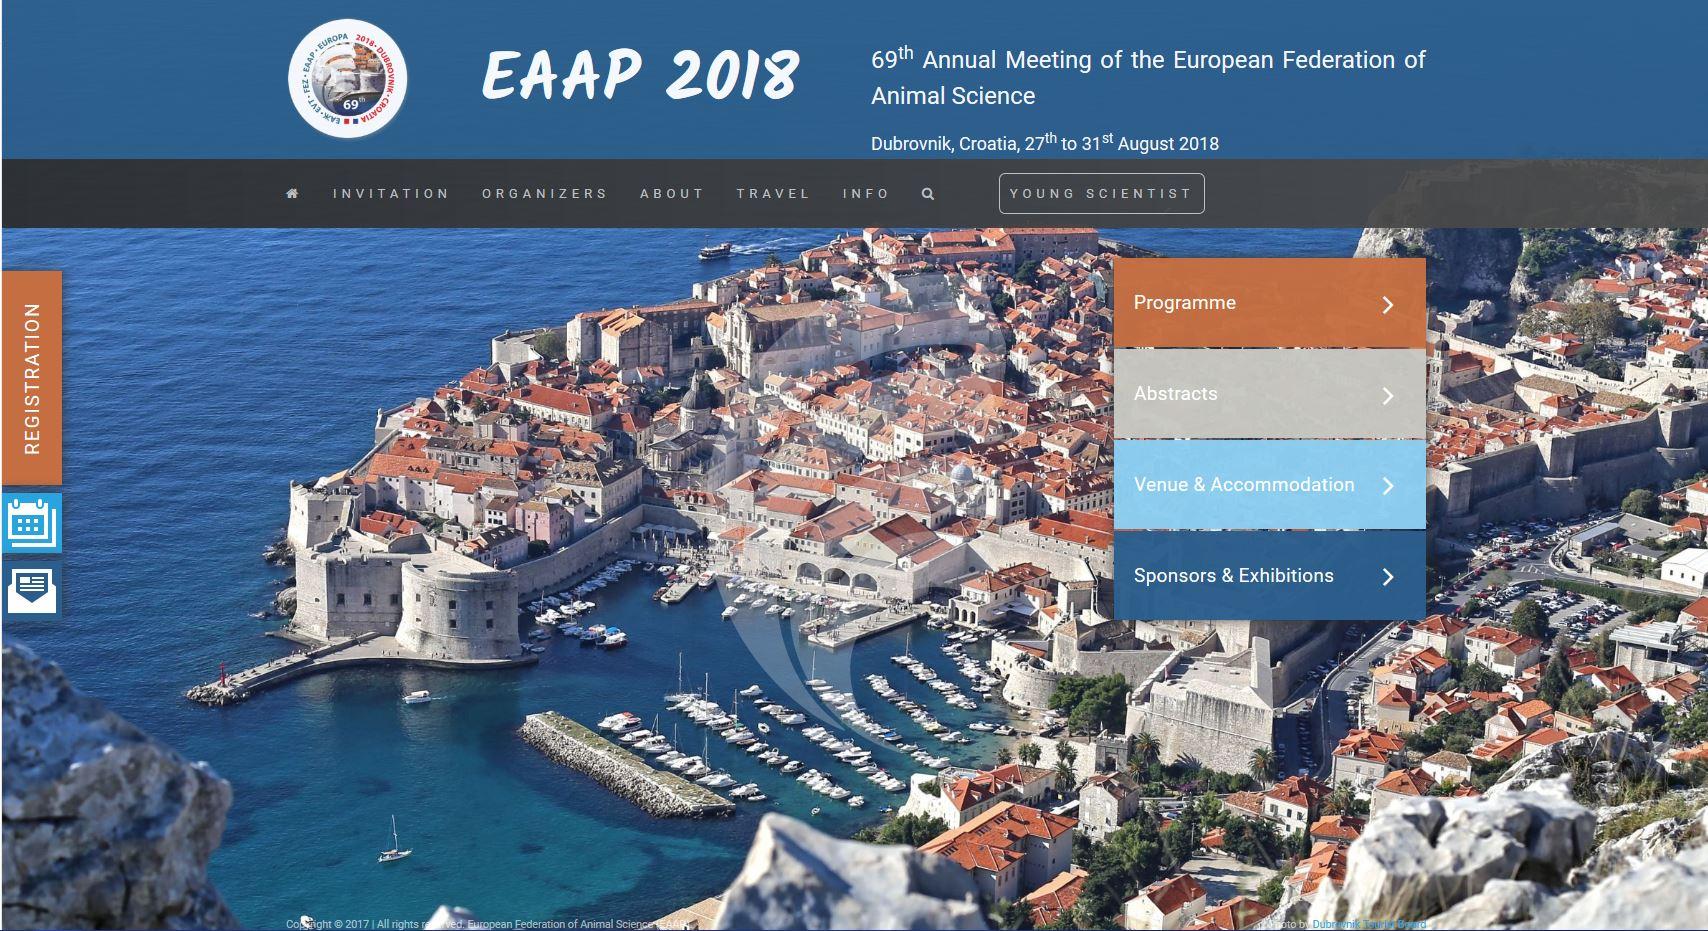 EAAP2018 pic